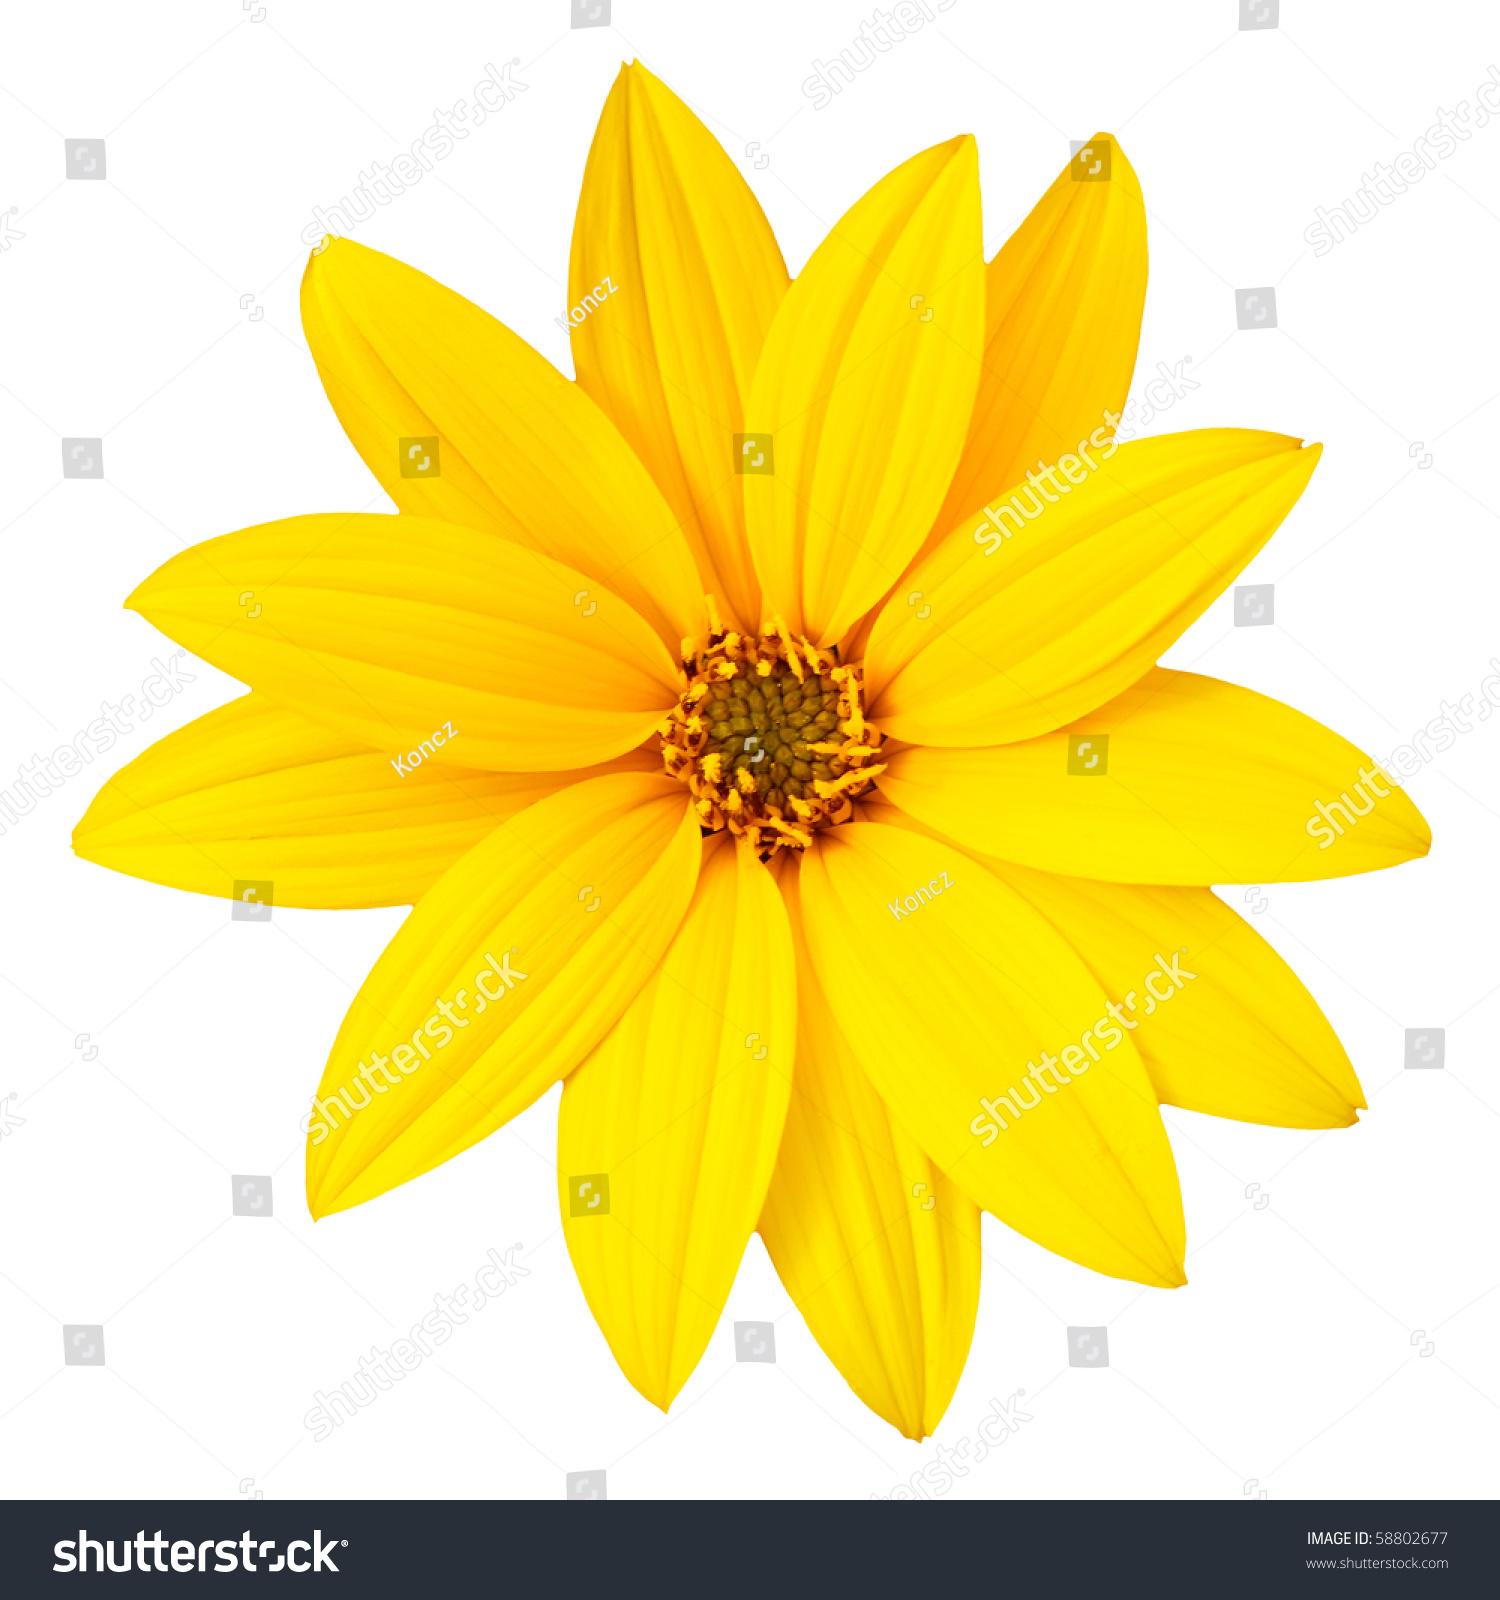 Yellow Flower Isolated On White Background Stock Photo ...